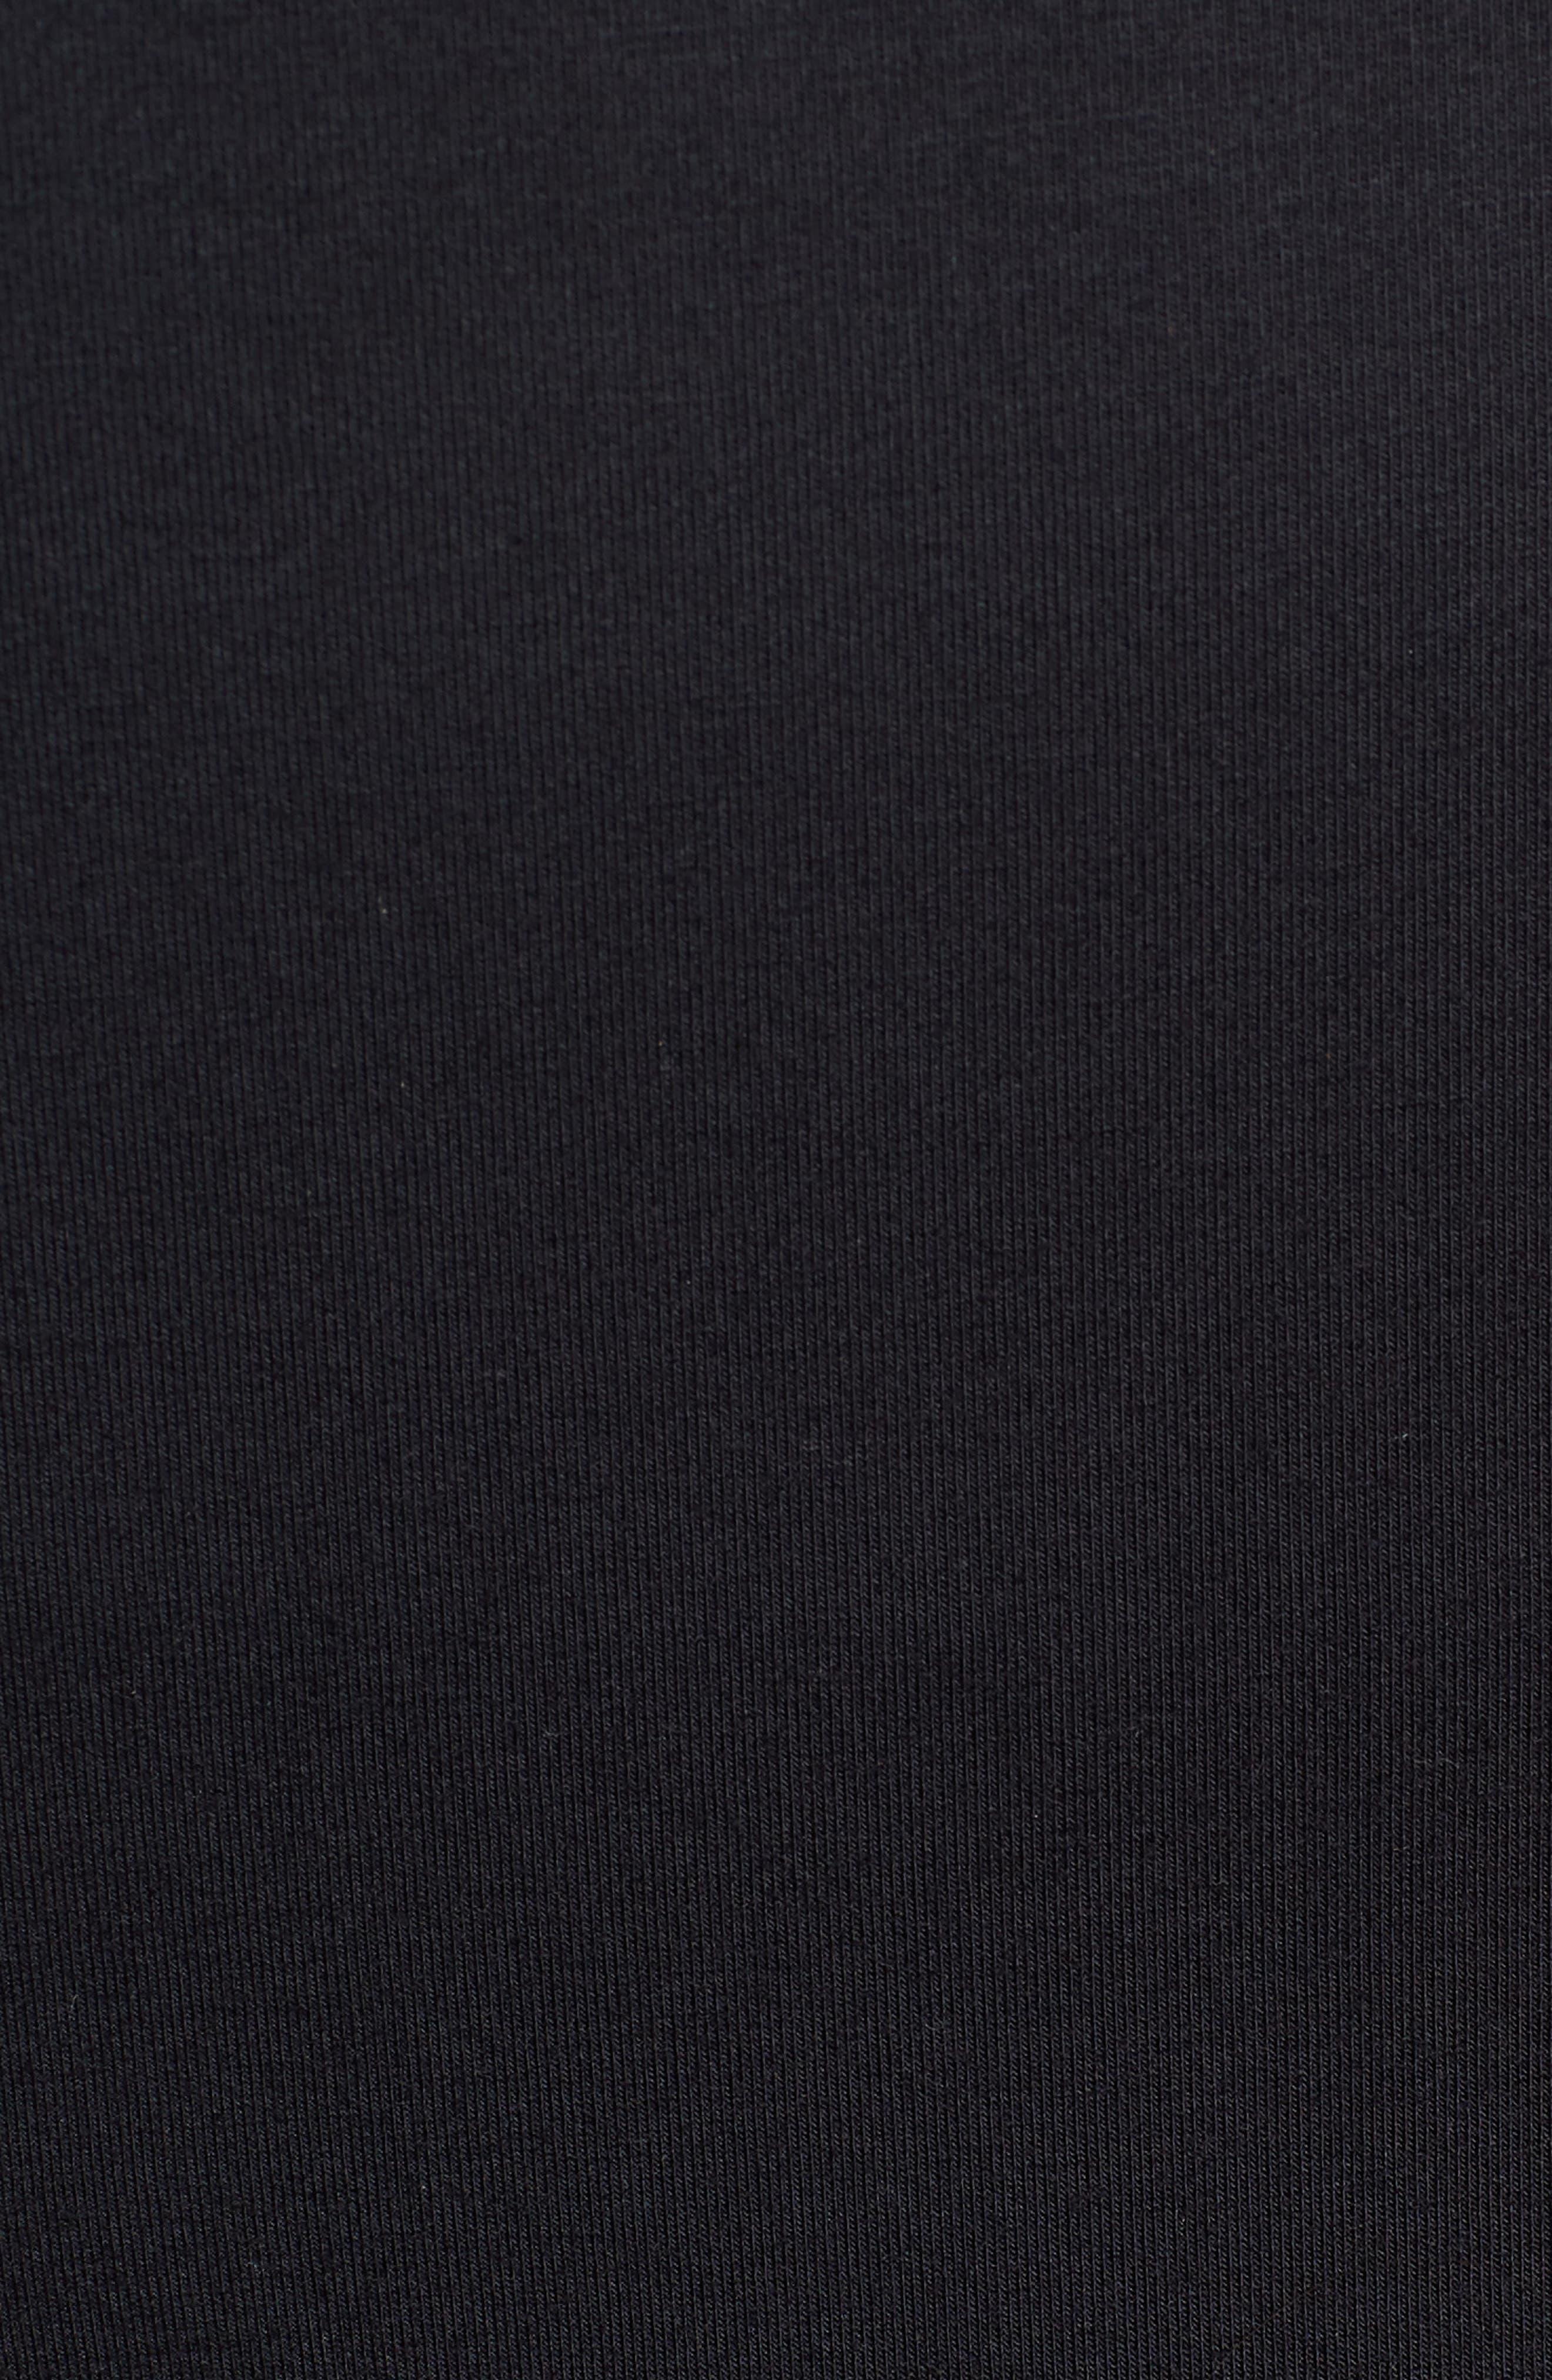 Aerosmith Bodysuit,                             Alternate thumbnail 5, color,                             Black